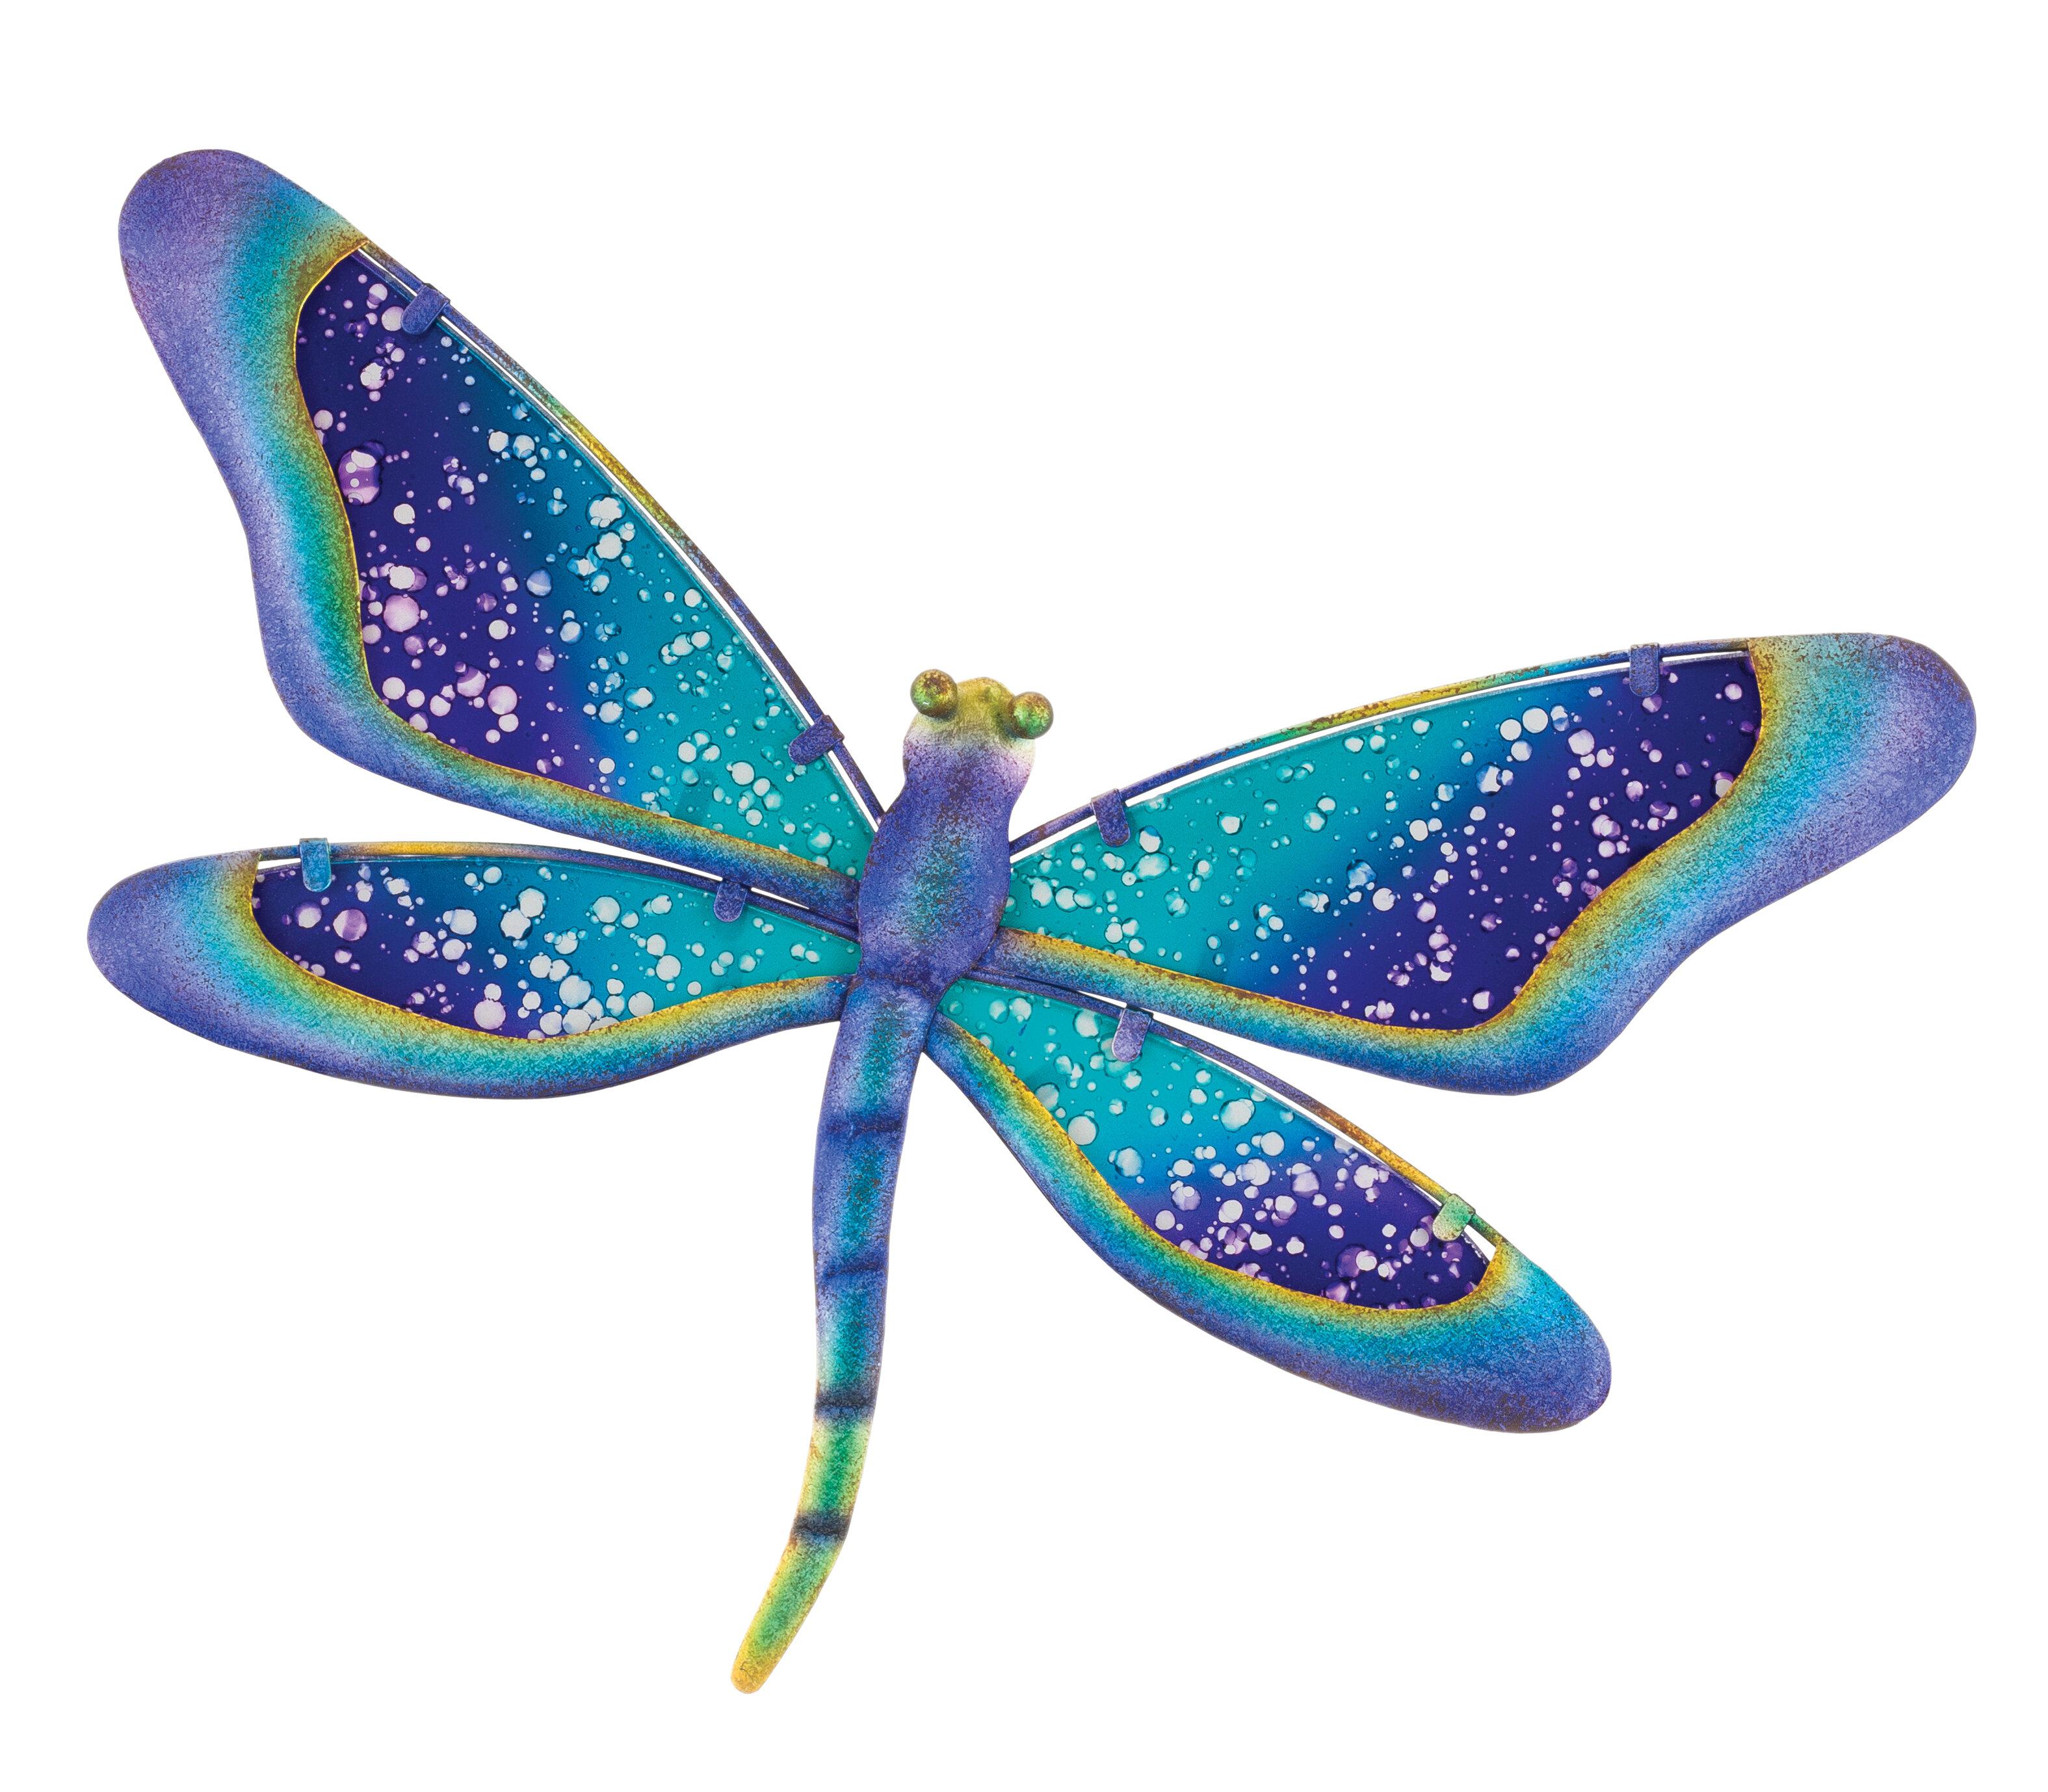 NEW Regal Art Gift Capri Dragonfly Wall Decor Metal Pastel Blue Set of 3